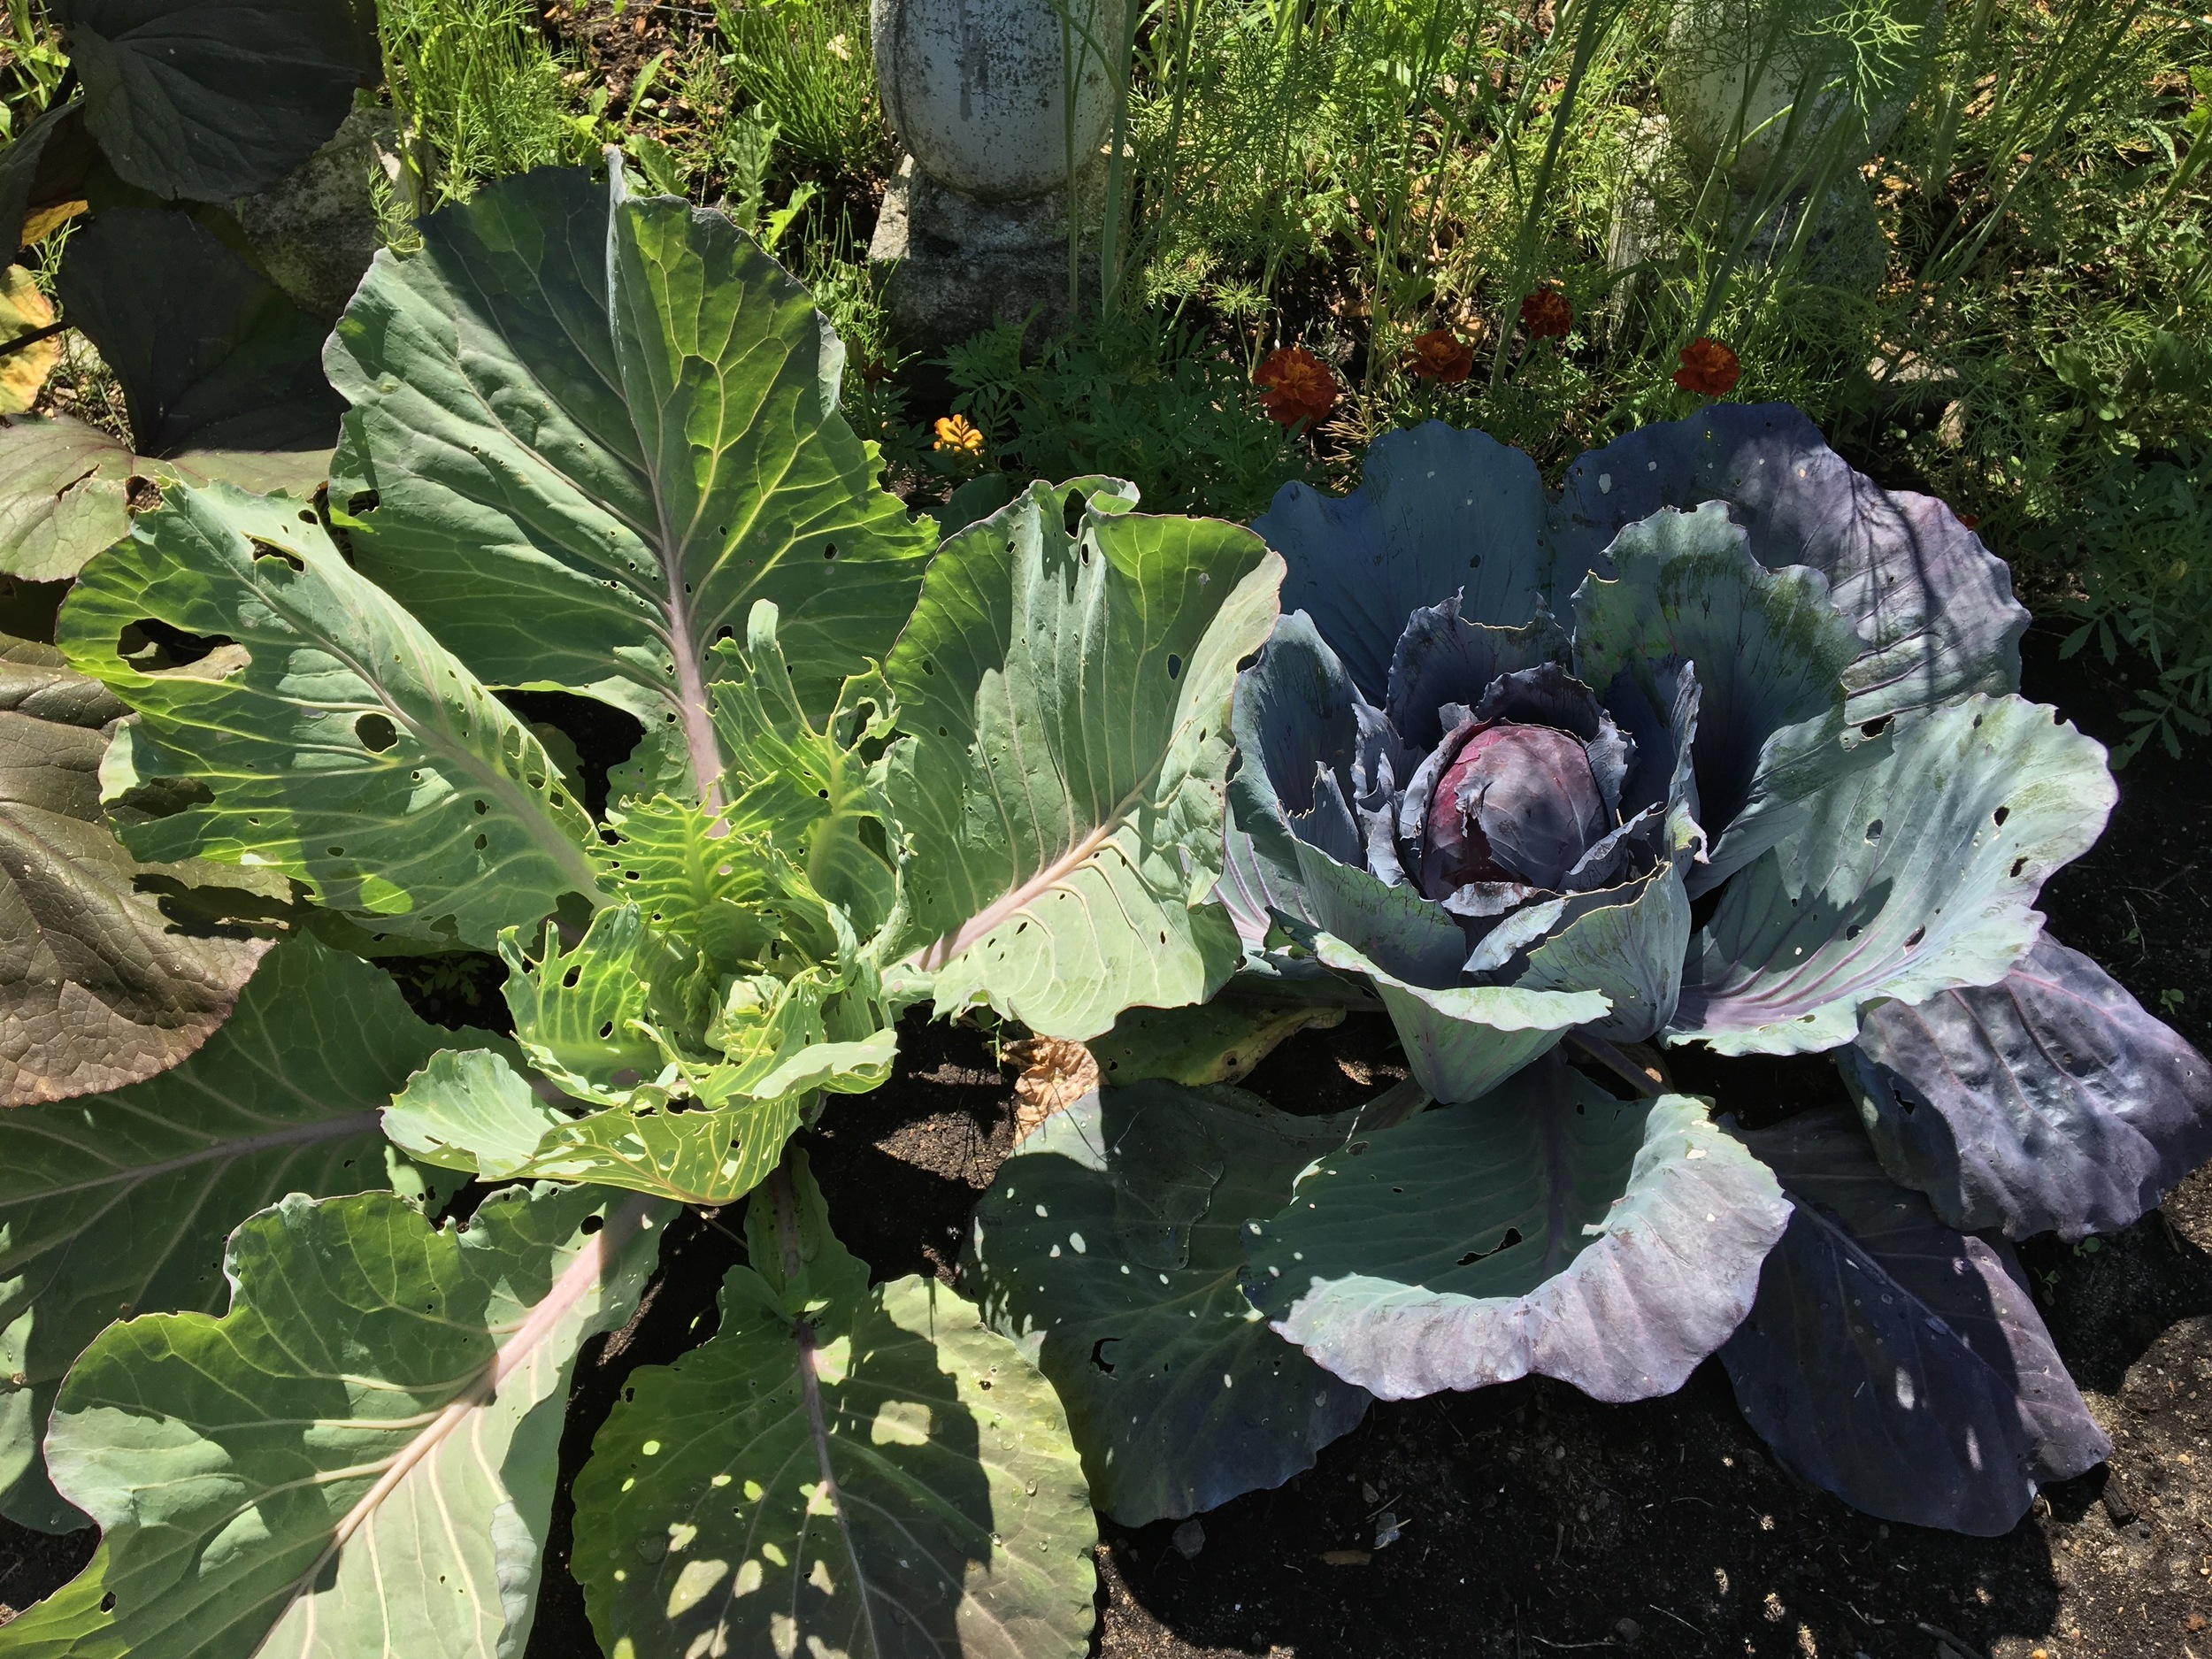 Brunswick Green and Danish Red Cabbage